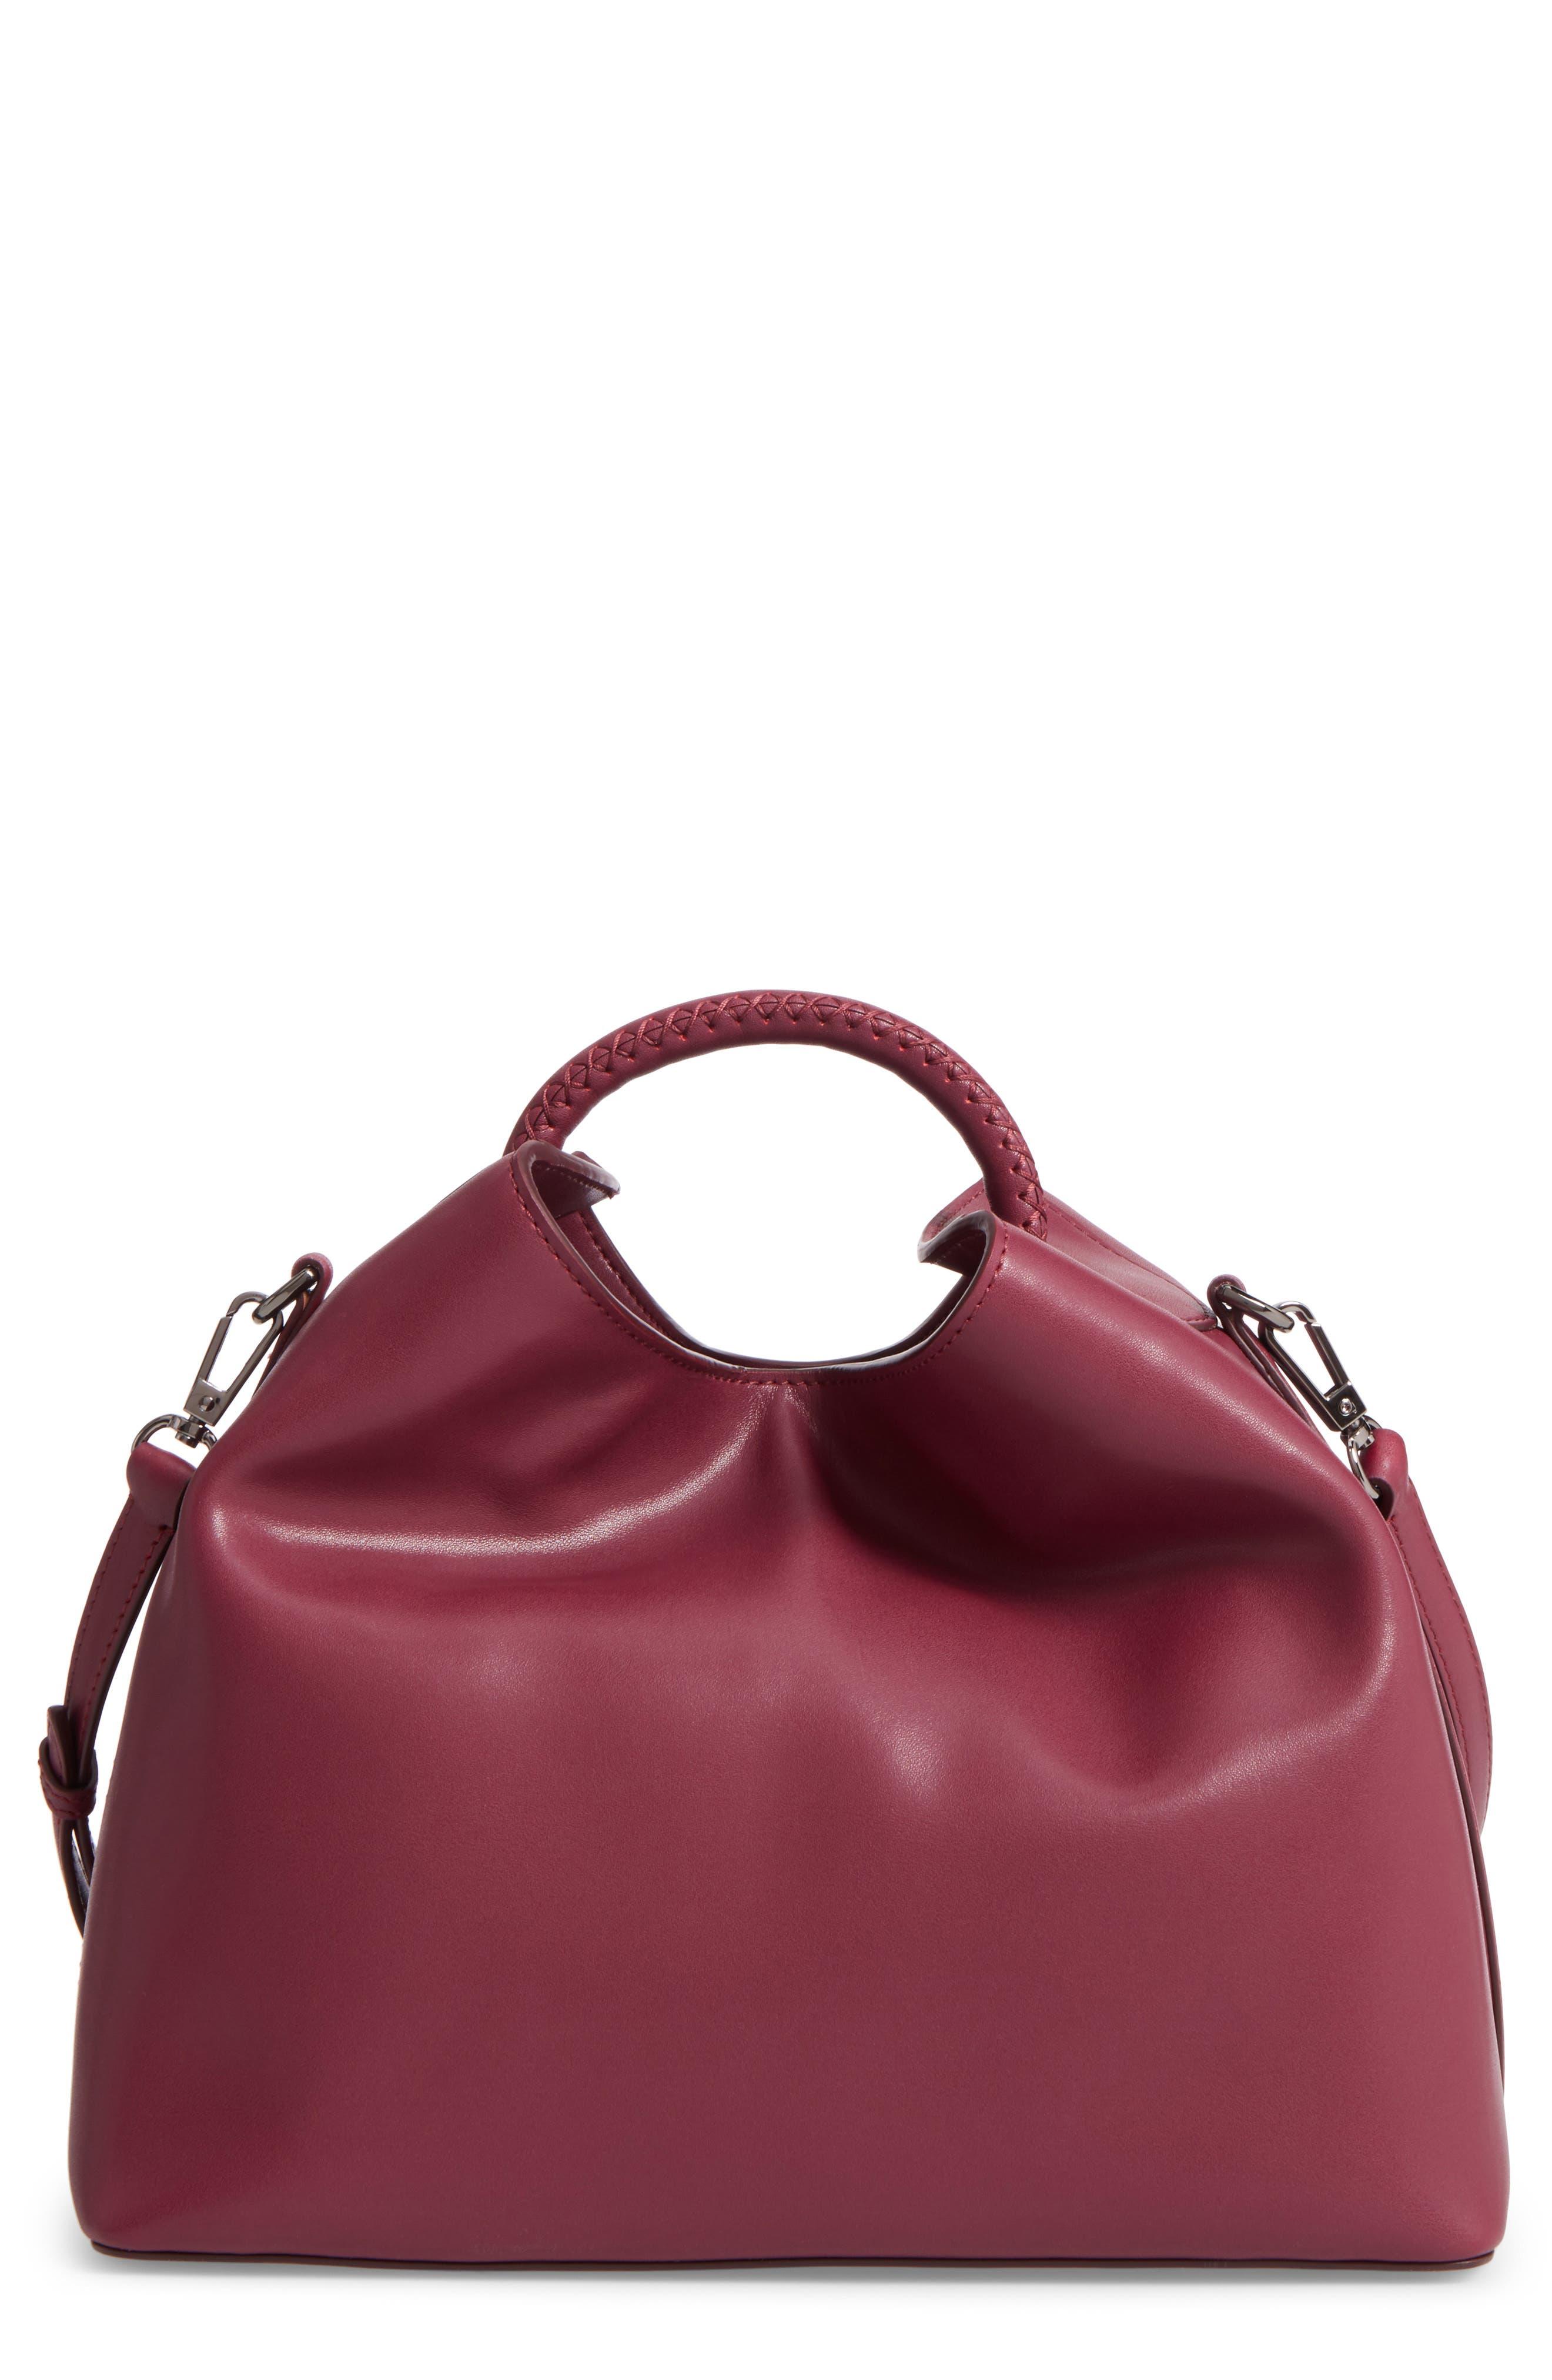 Raisin Leather Handbag,                             Main thumbnail 8, color,